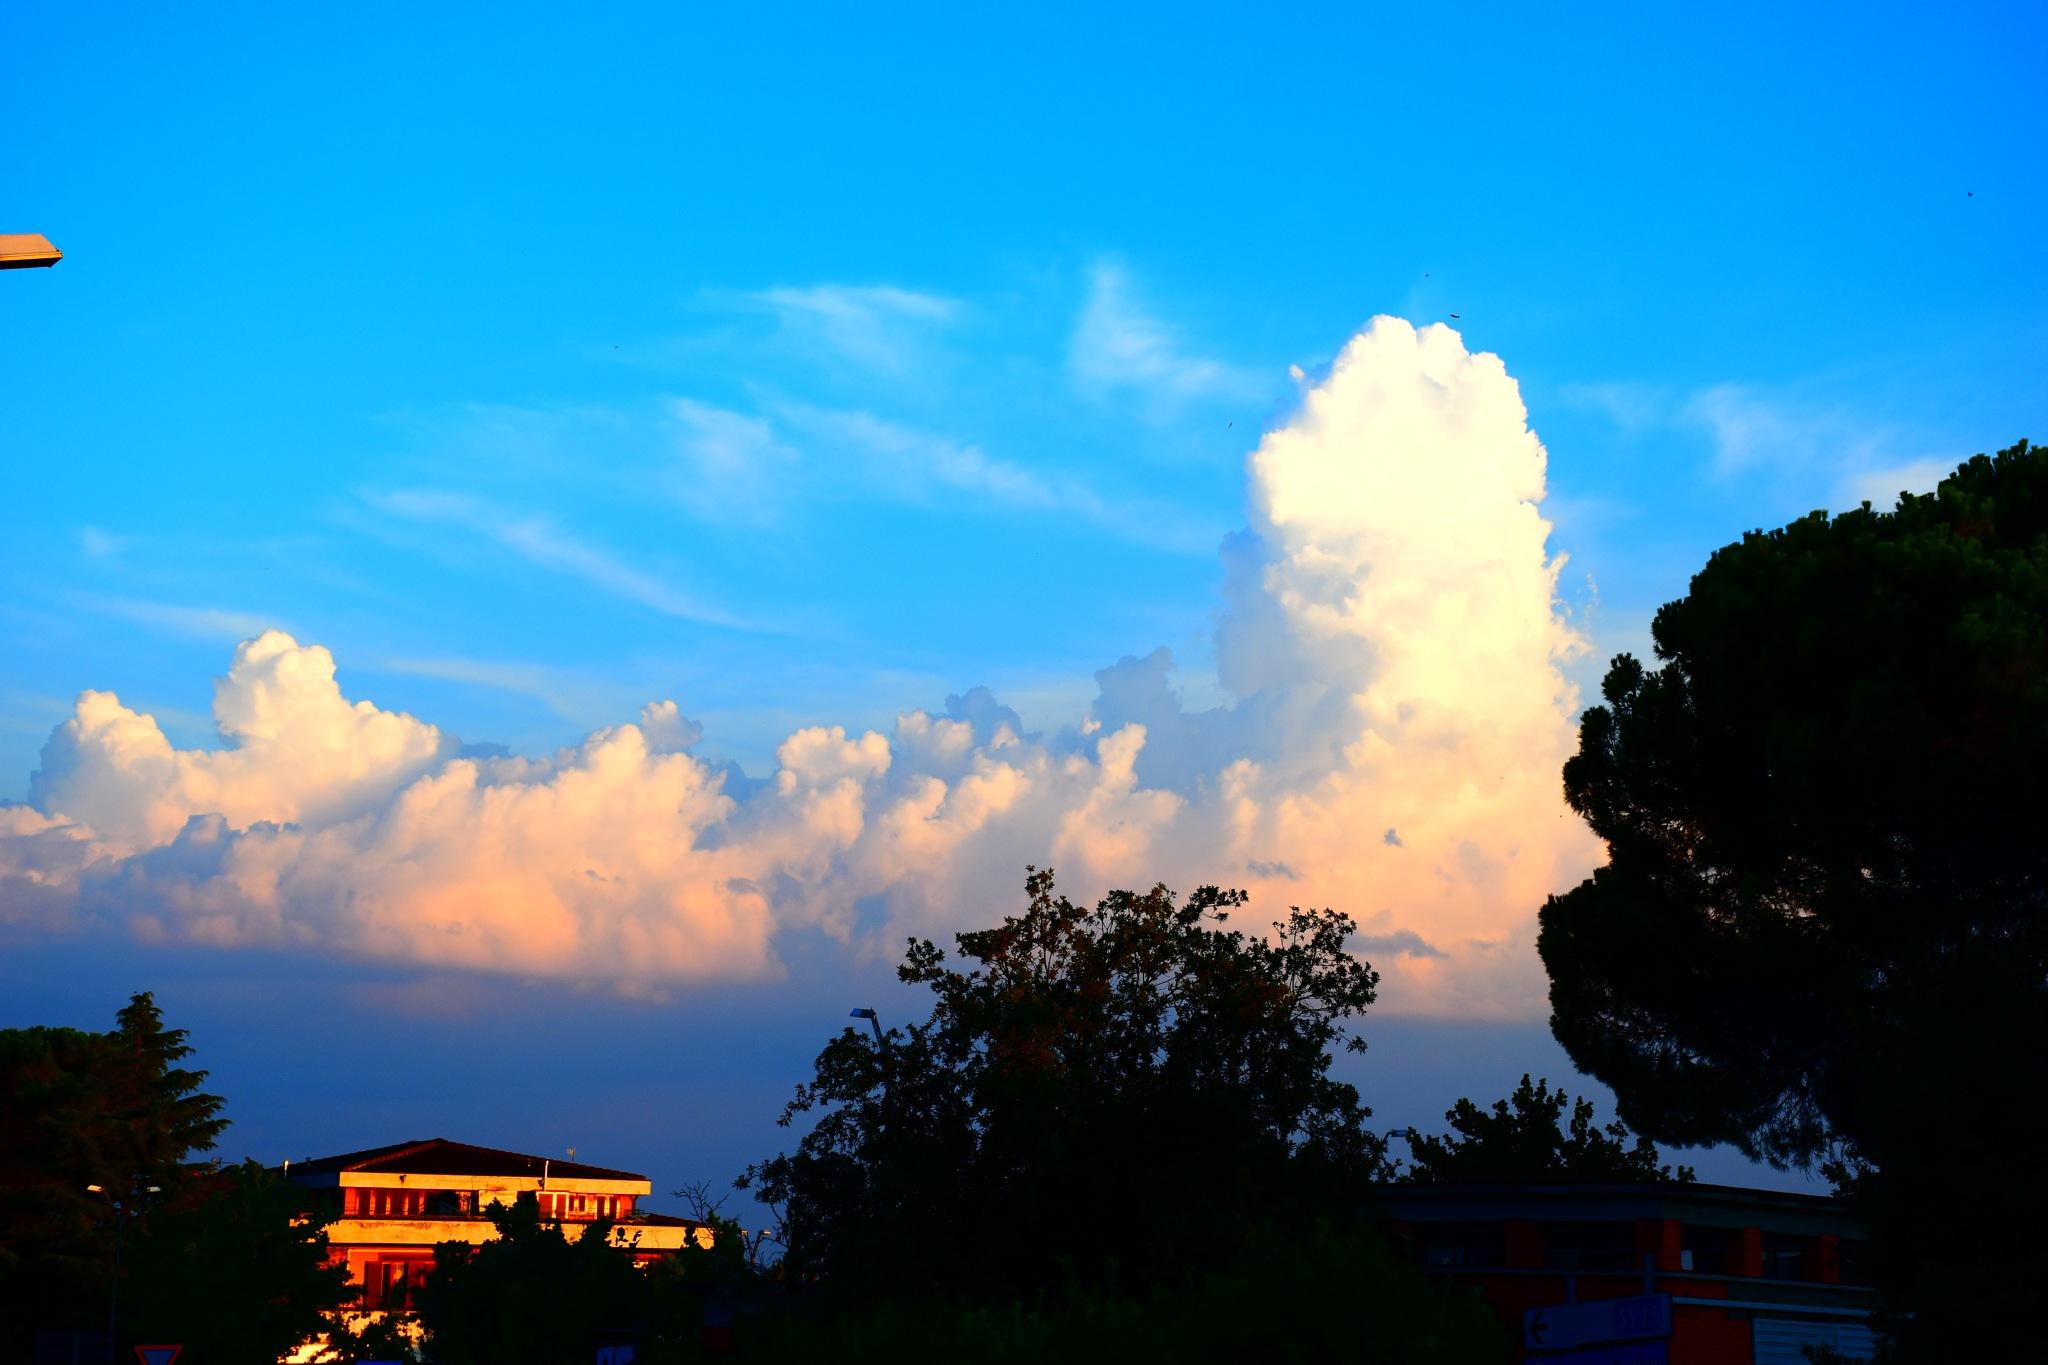 Nuvole al Tramonto by Andres Camilo Peragine